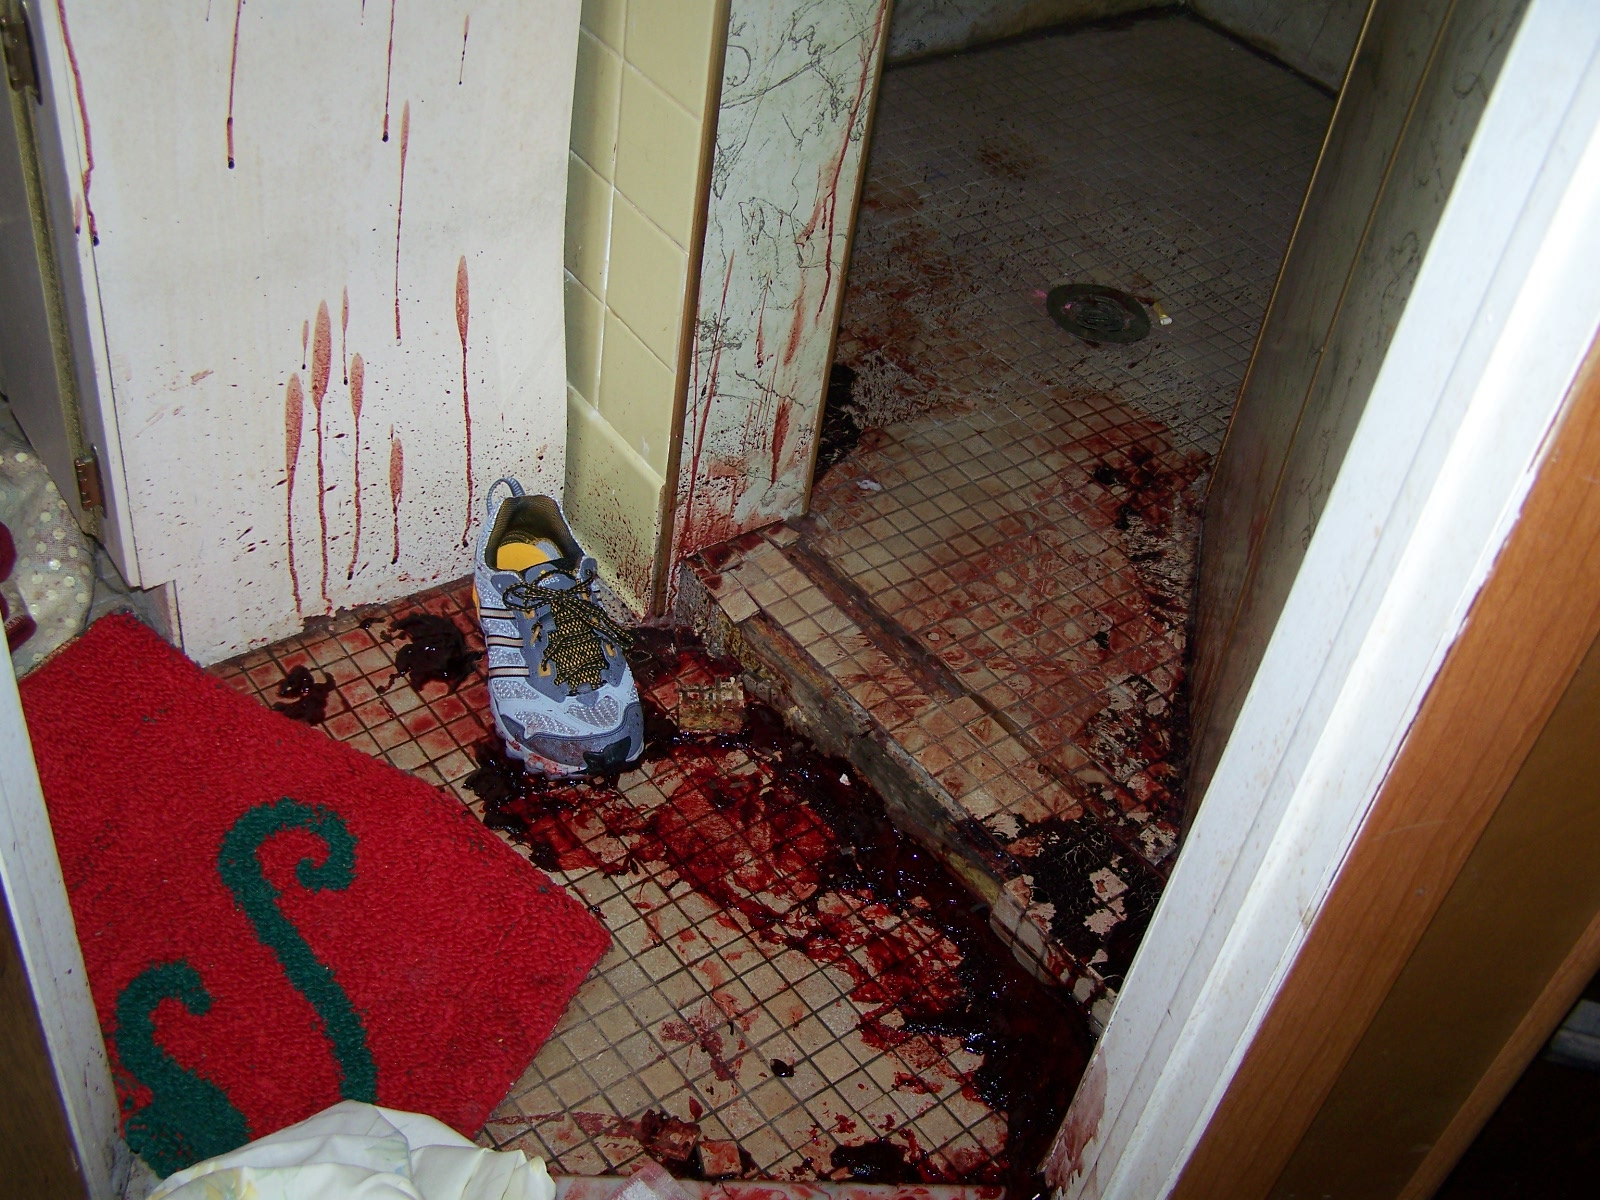 Remarkable, Real crime scene consider, that